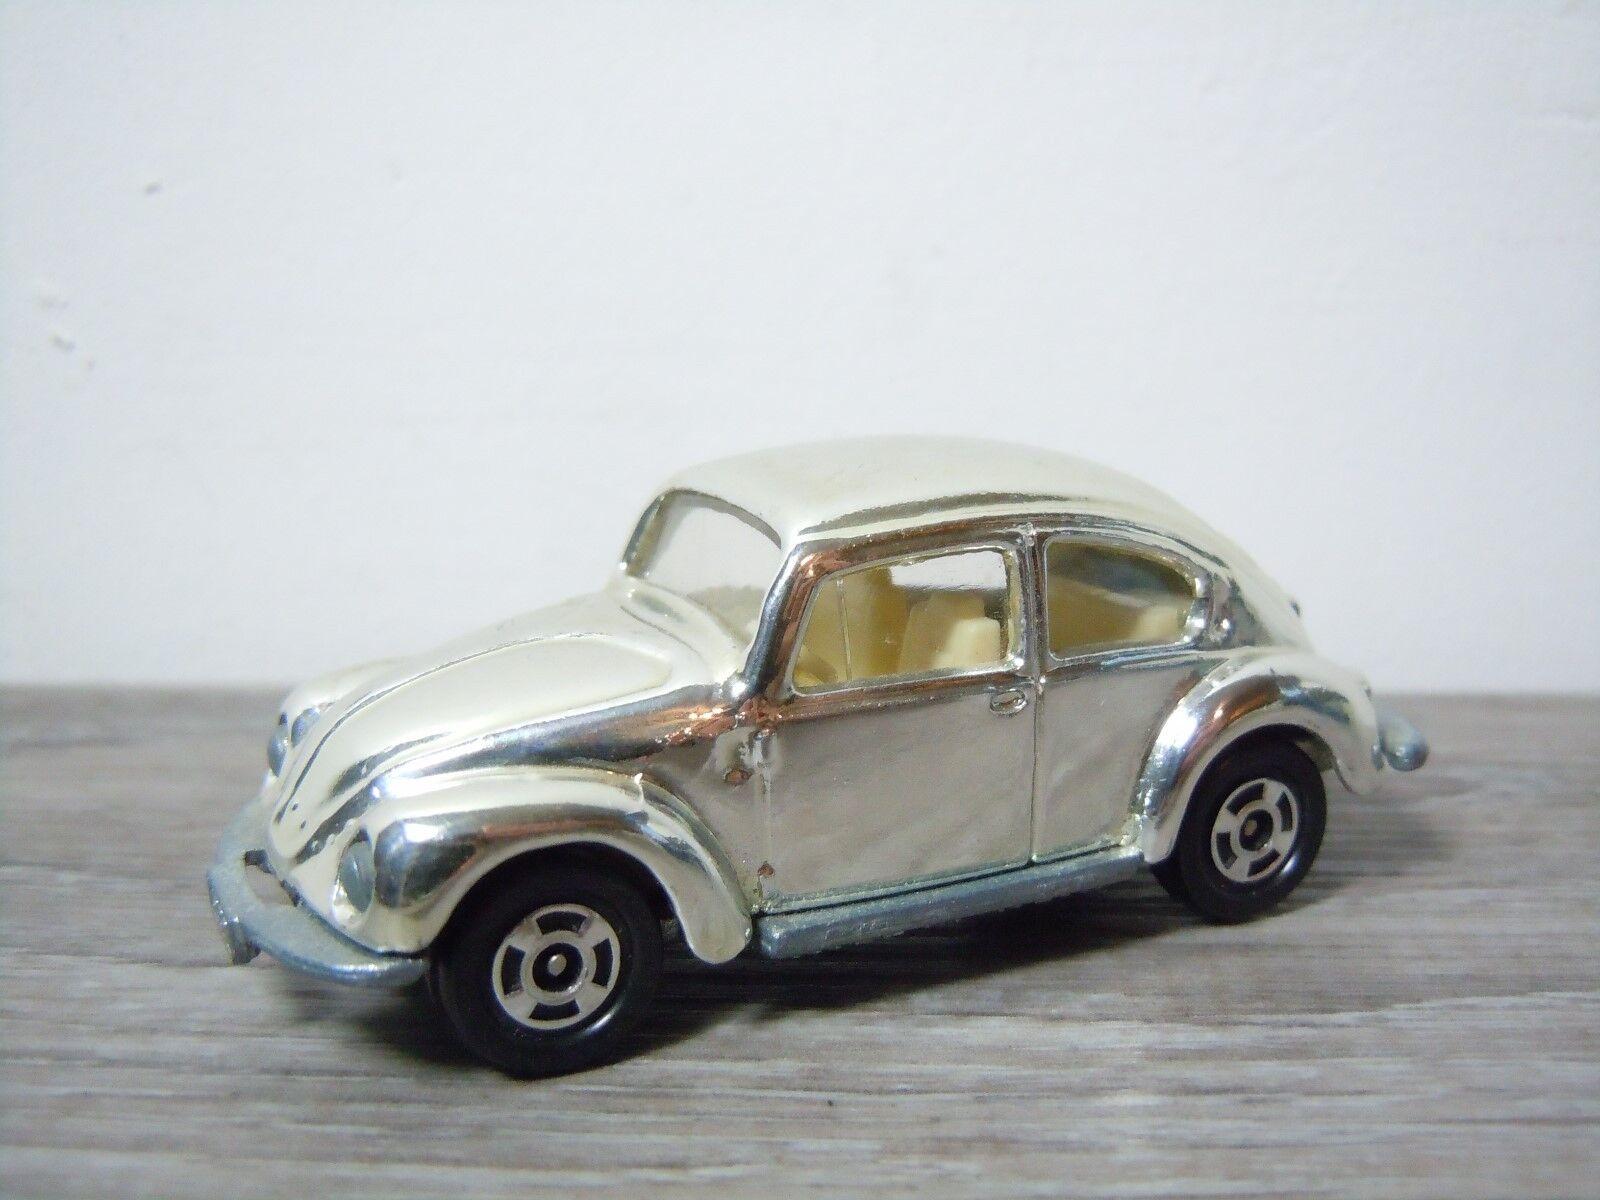 VW Volkswagen Beetle Chrome van Tomica F20 Japan 1 60 26044